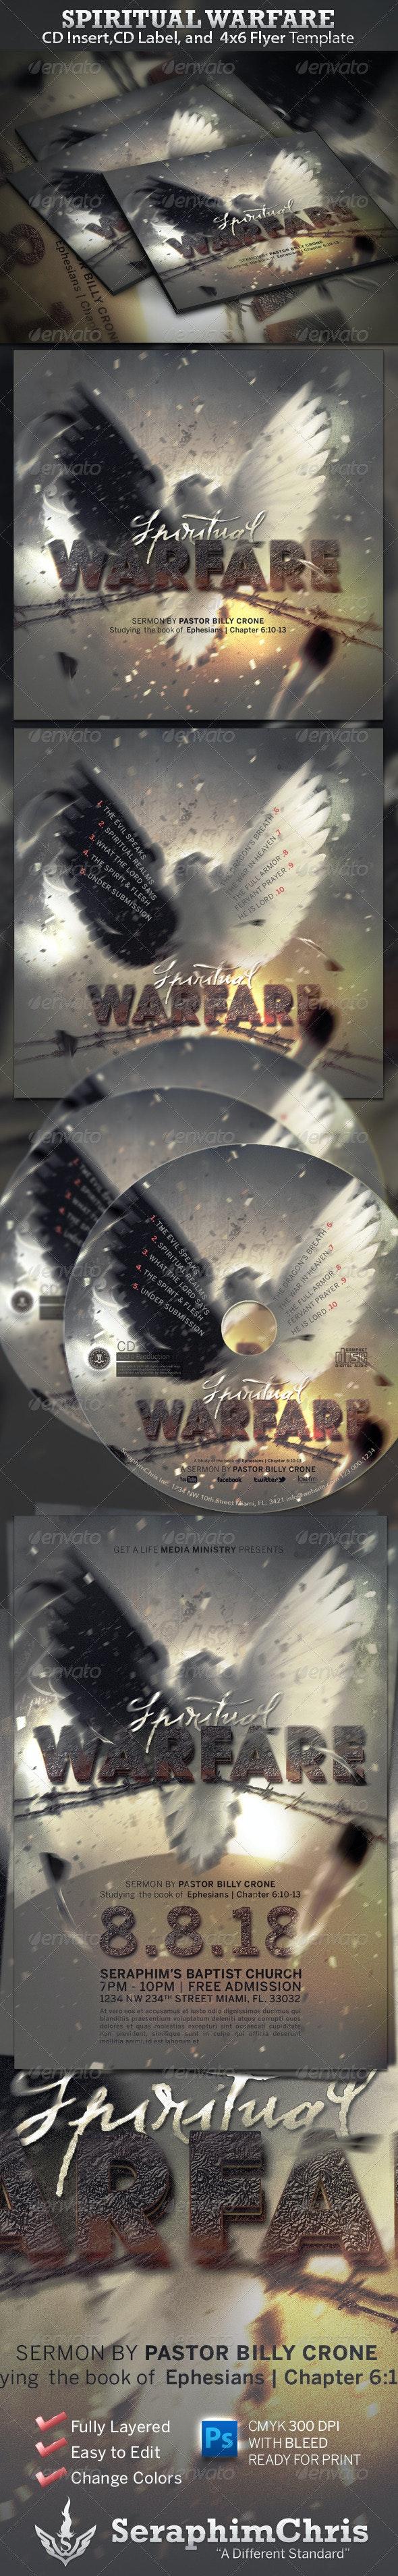 Spiritual Warfare CD Insert, CD Label , and Flyer - CD & DVD Artwork Print Templates